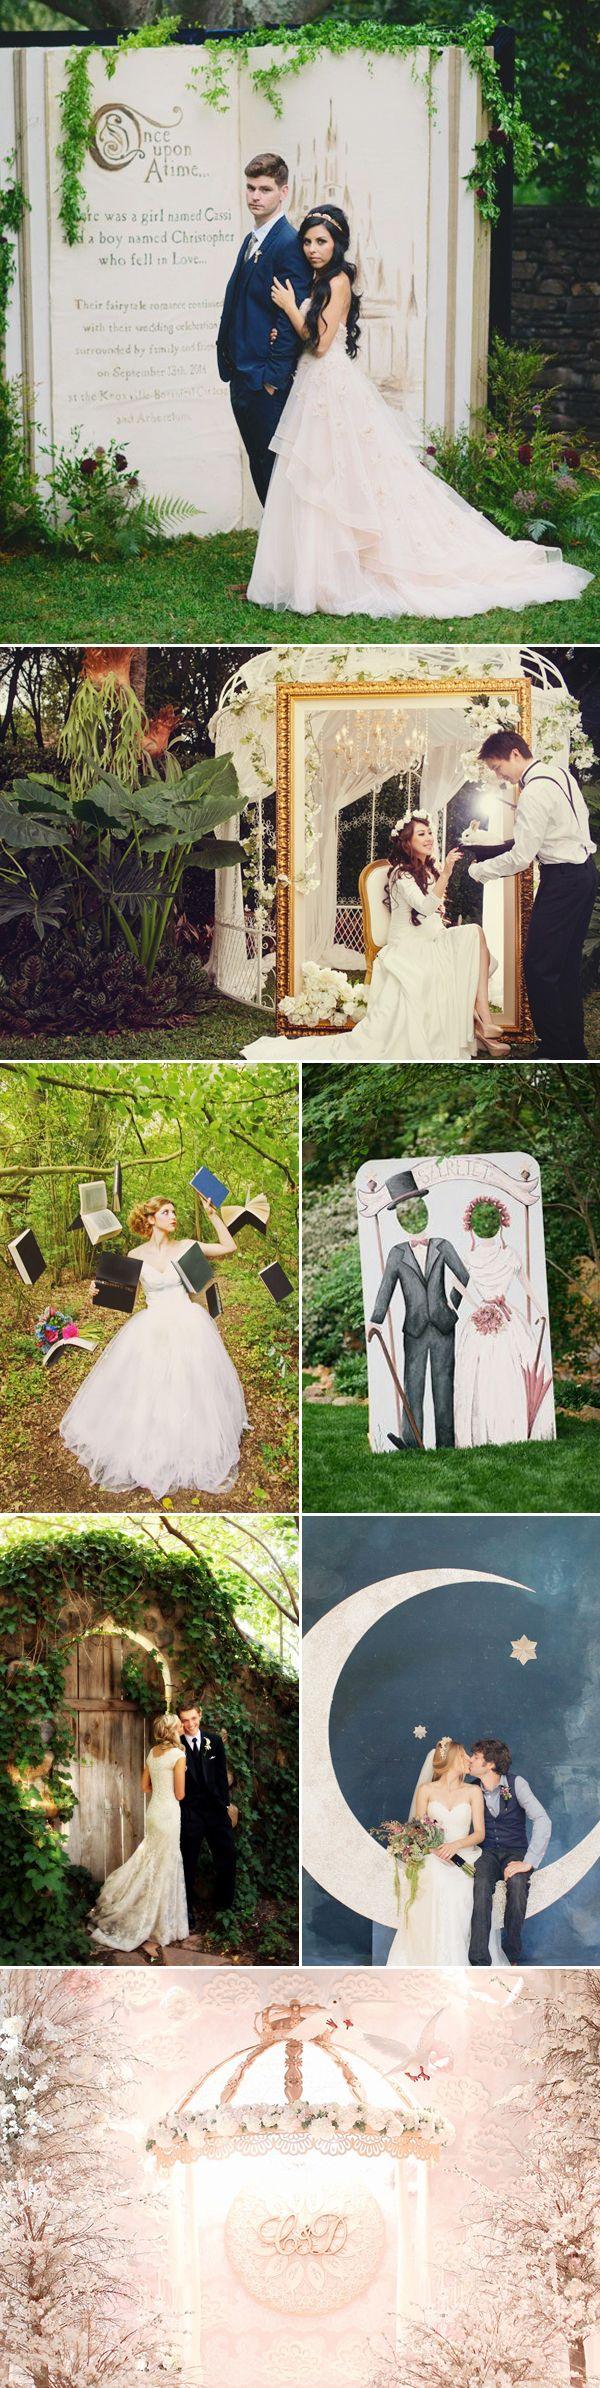 Oh Snap! 45 Creative Wedding Photo Backdrops